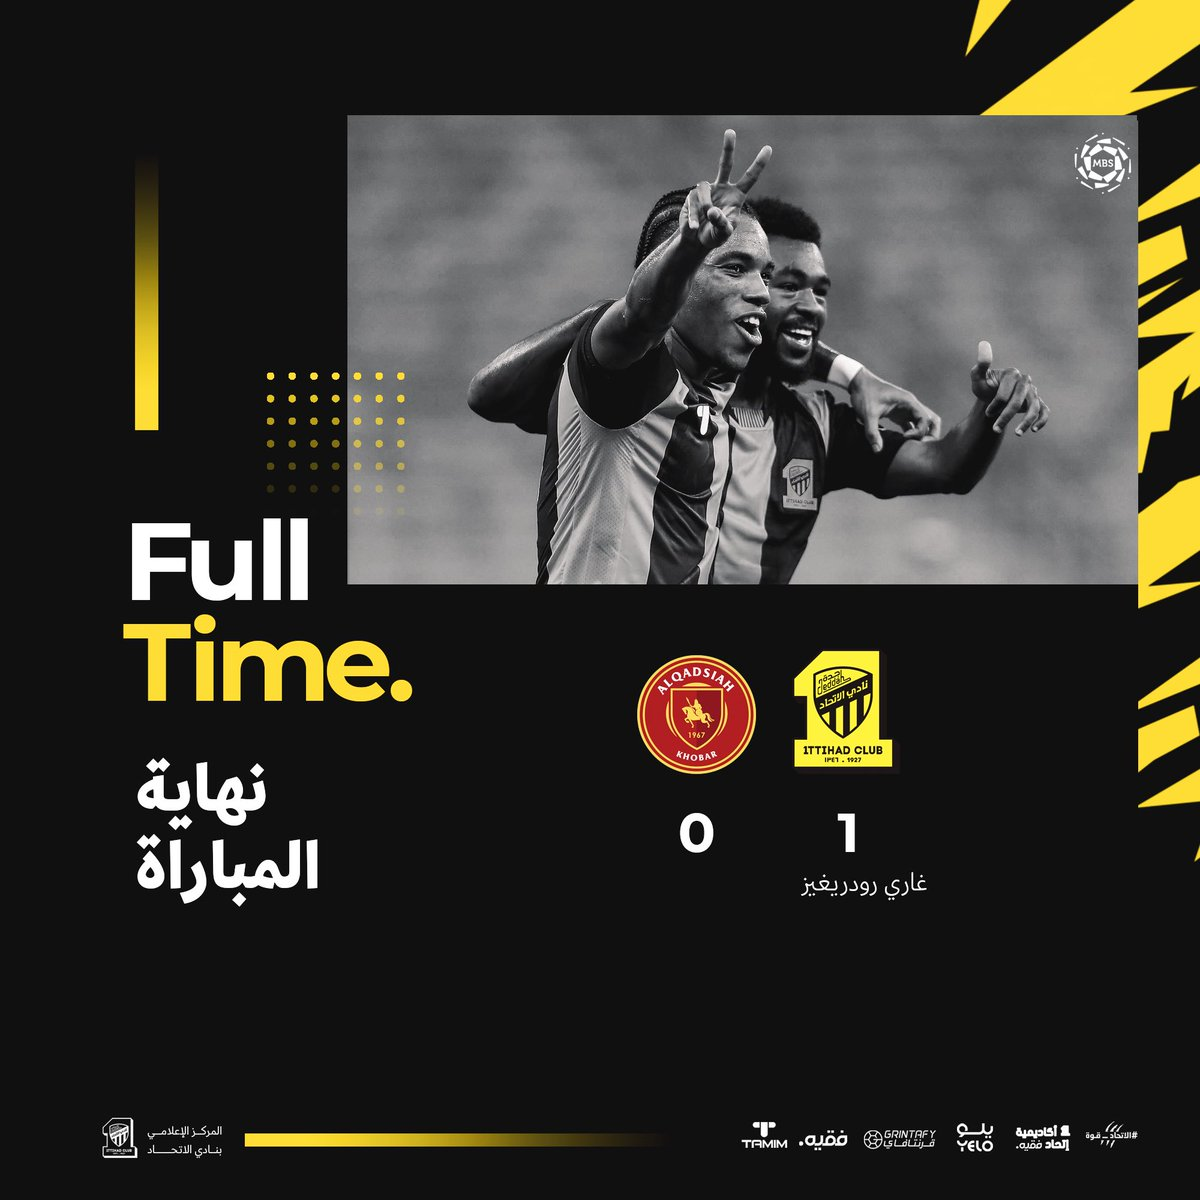 ⚽️دوري كأس الأمير محمد بن سلمان: #الاتحاد_القادسية مبروك لجماهير الذهب 💛🖤